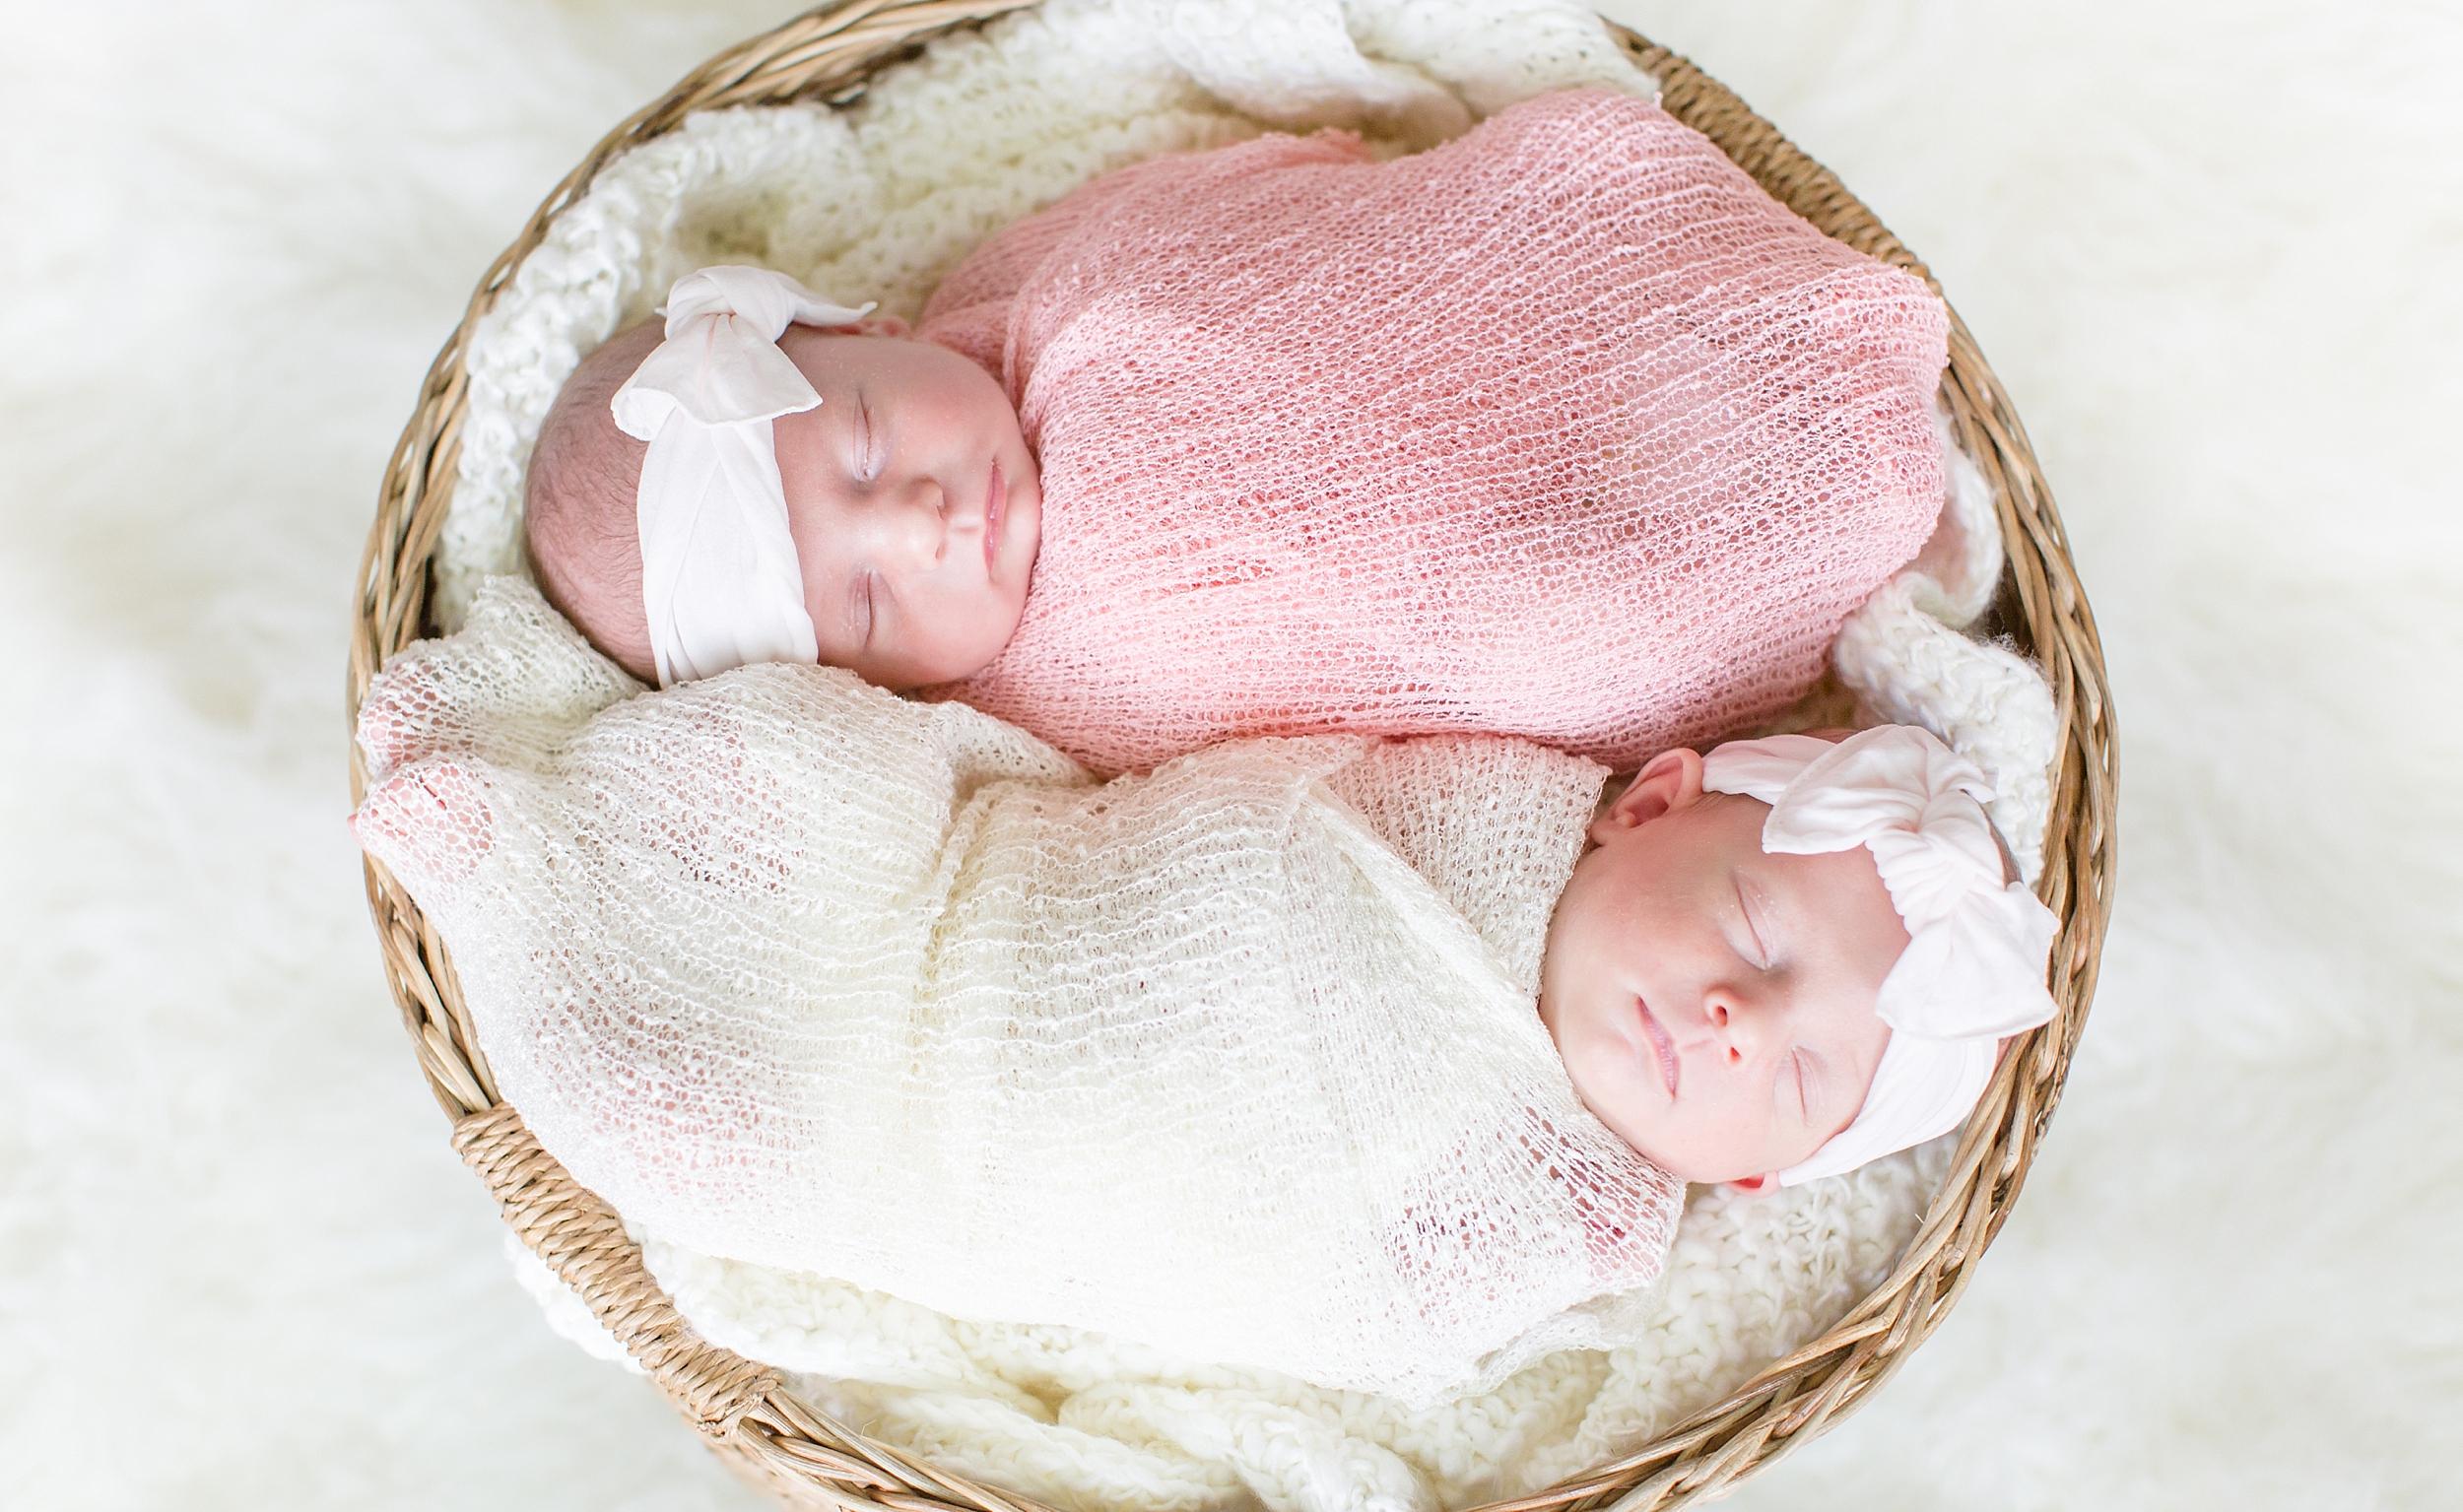 Landon-Schneider-Photography-Holt-Newborn-Session-Texas_0001.jpg